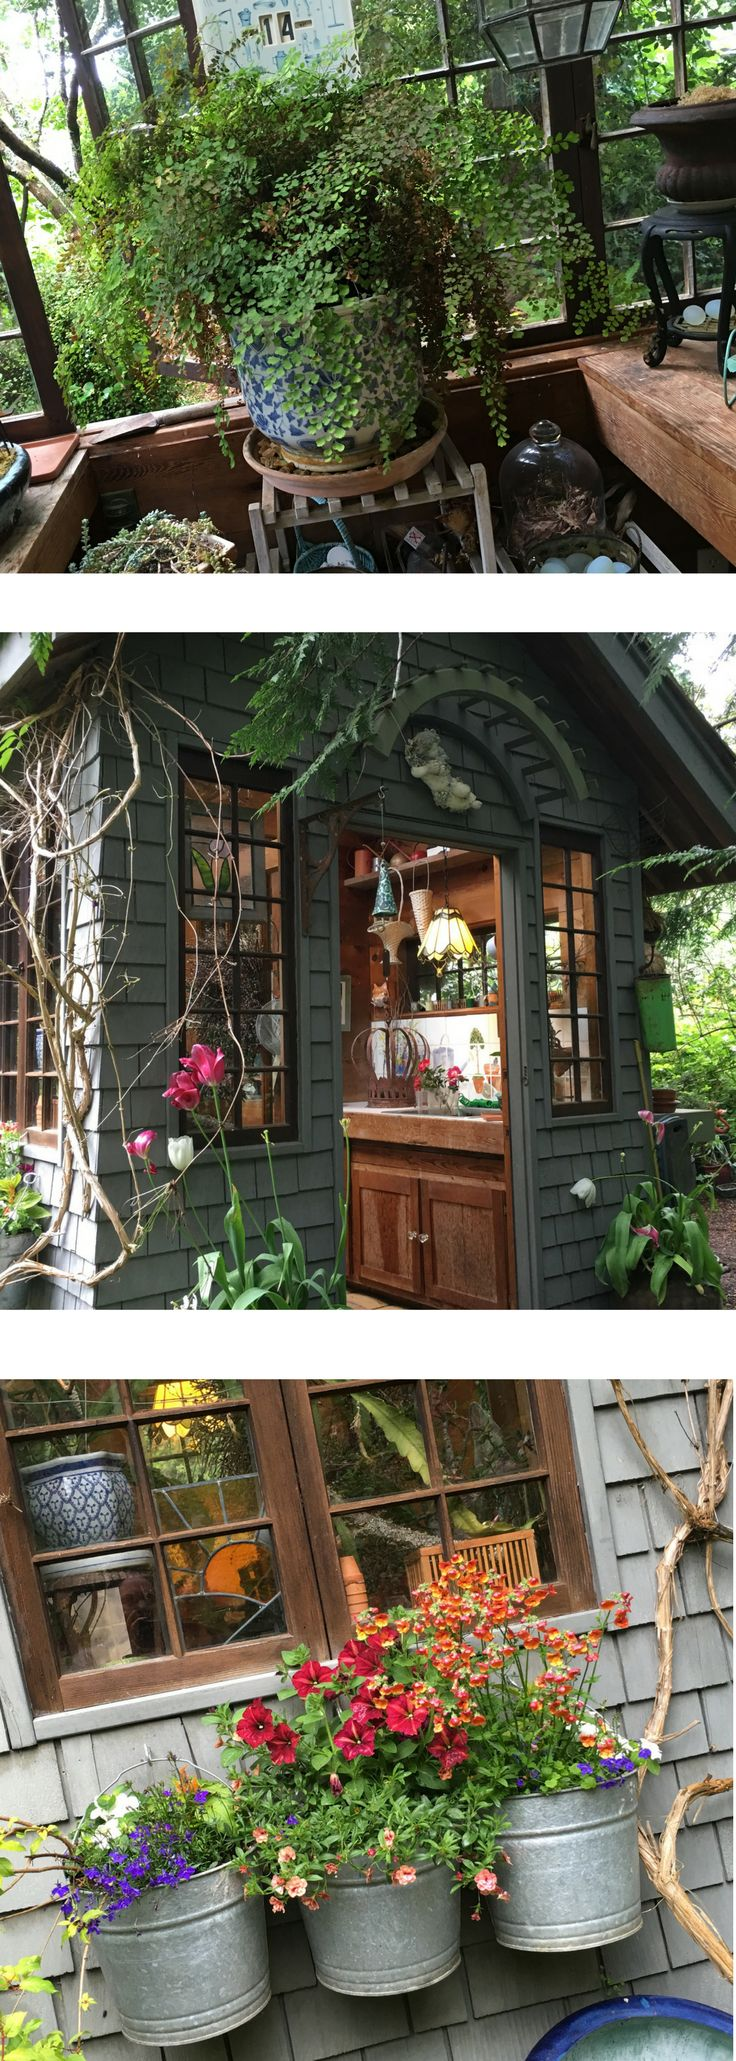 ^ 1000+ ideas about Sheds on Pinterest She sheds, Storage sheds ...